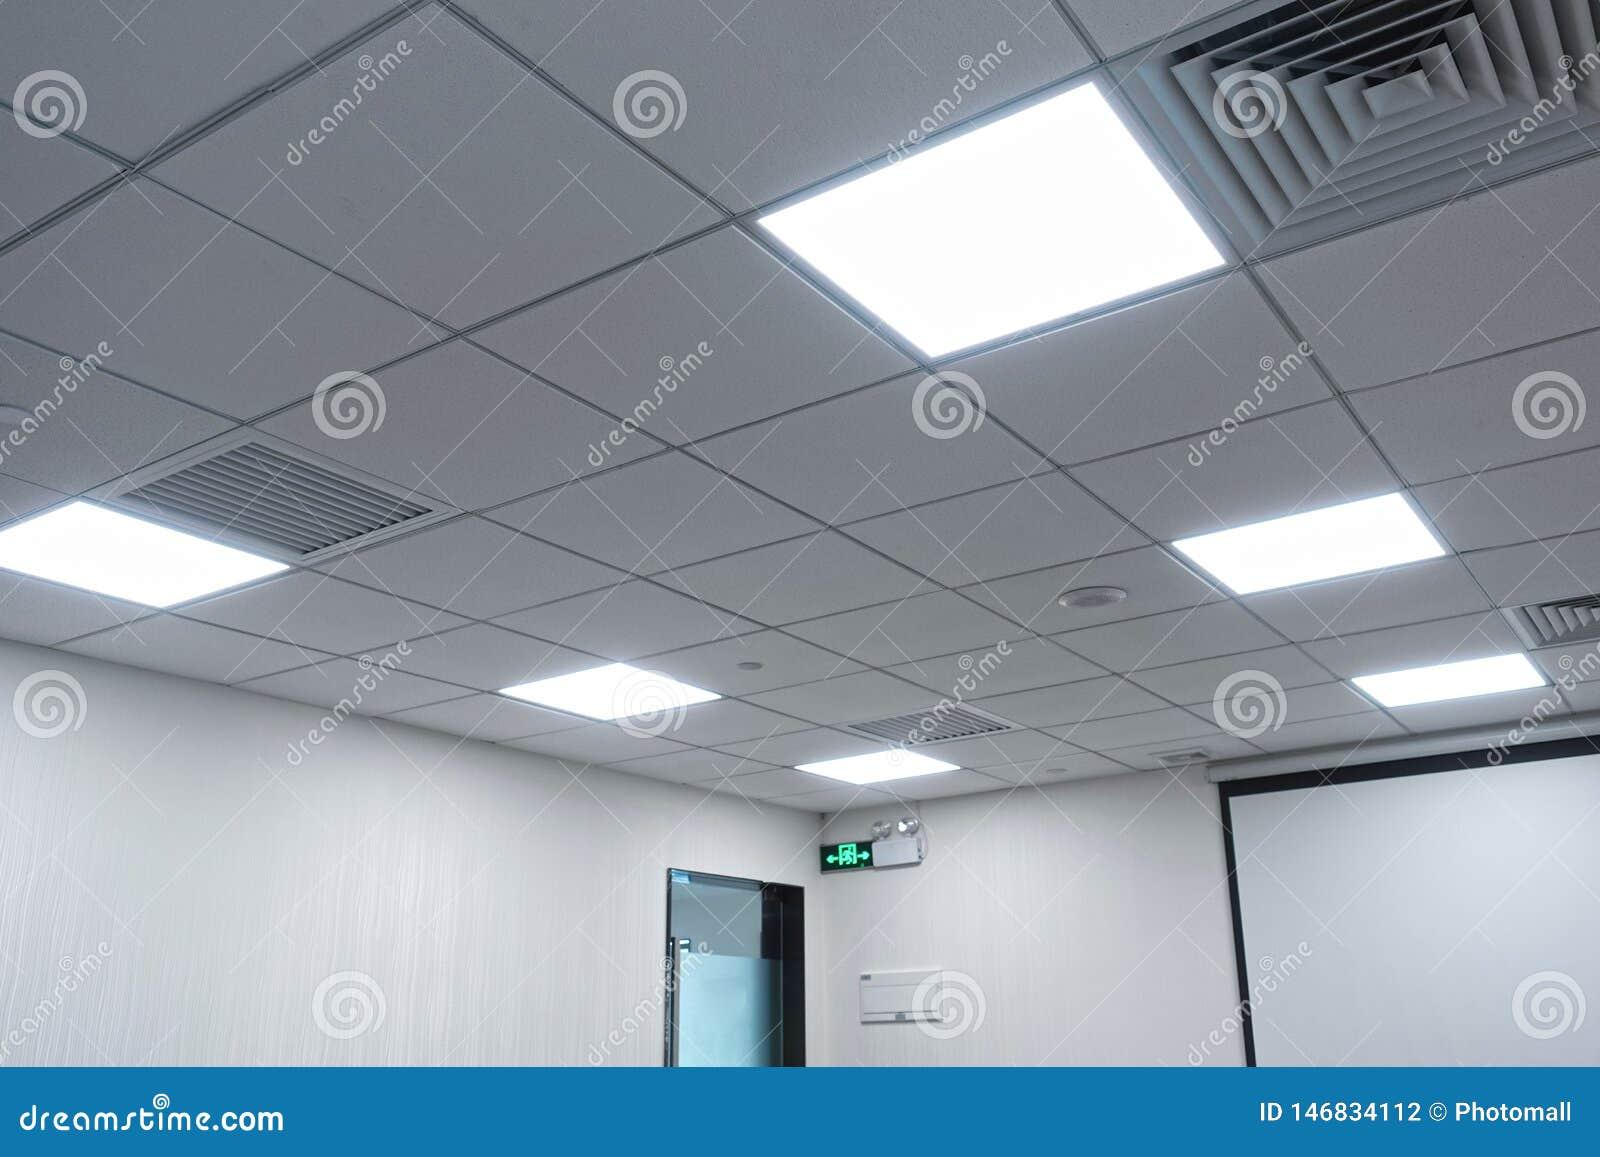 Led Panel Lamp On Modern Office Ceiling Stock Photo Image Of Build Halogen 146834112